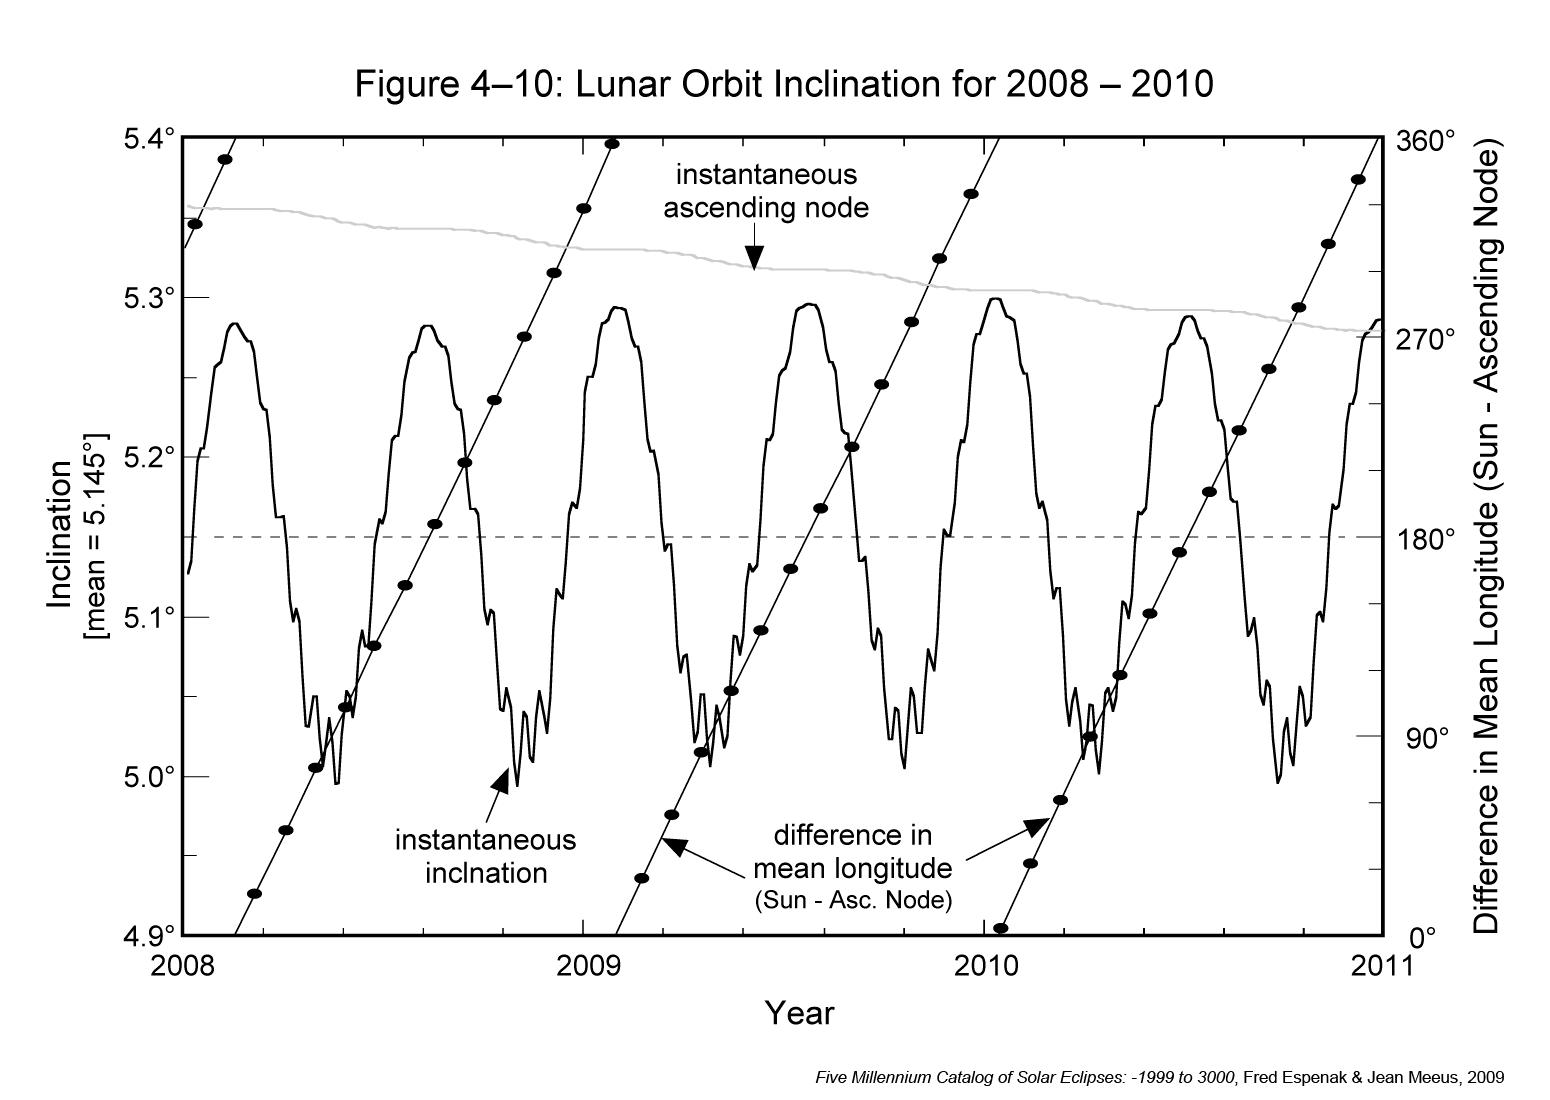 Lunar Orbital Inclination Changes